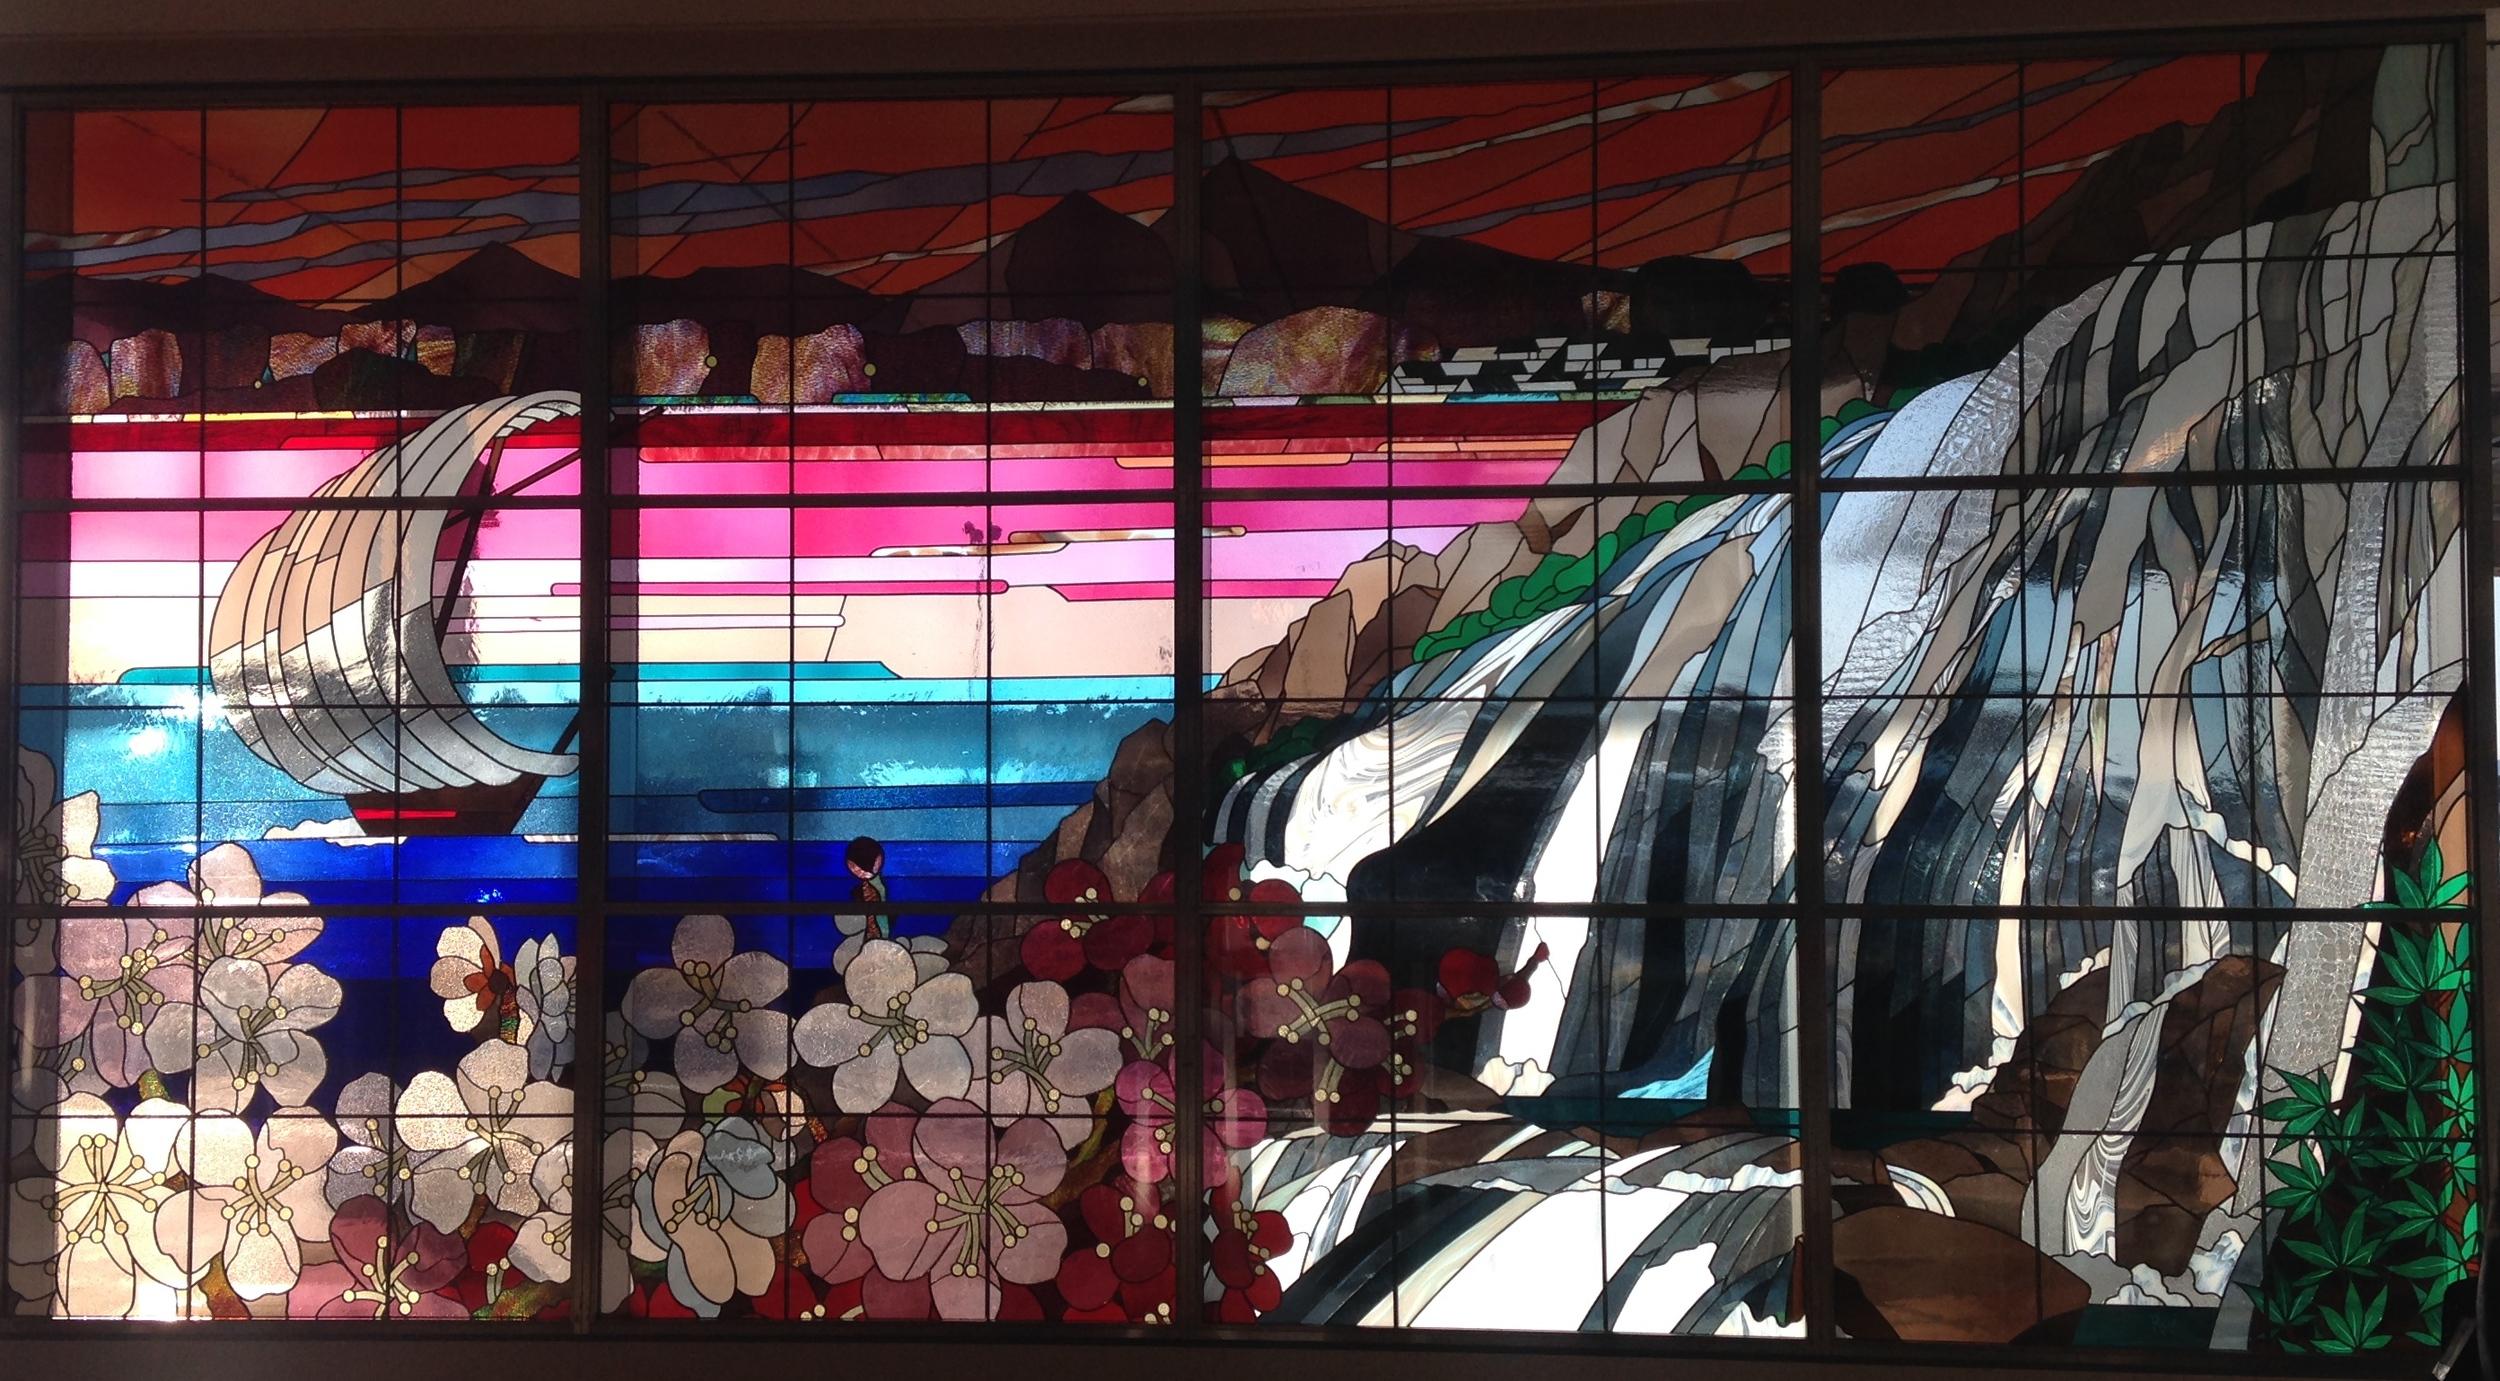 Ibaraki floor to ceiling stain glass